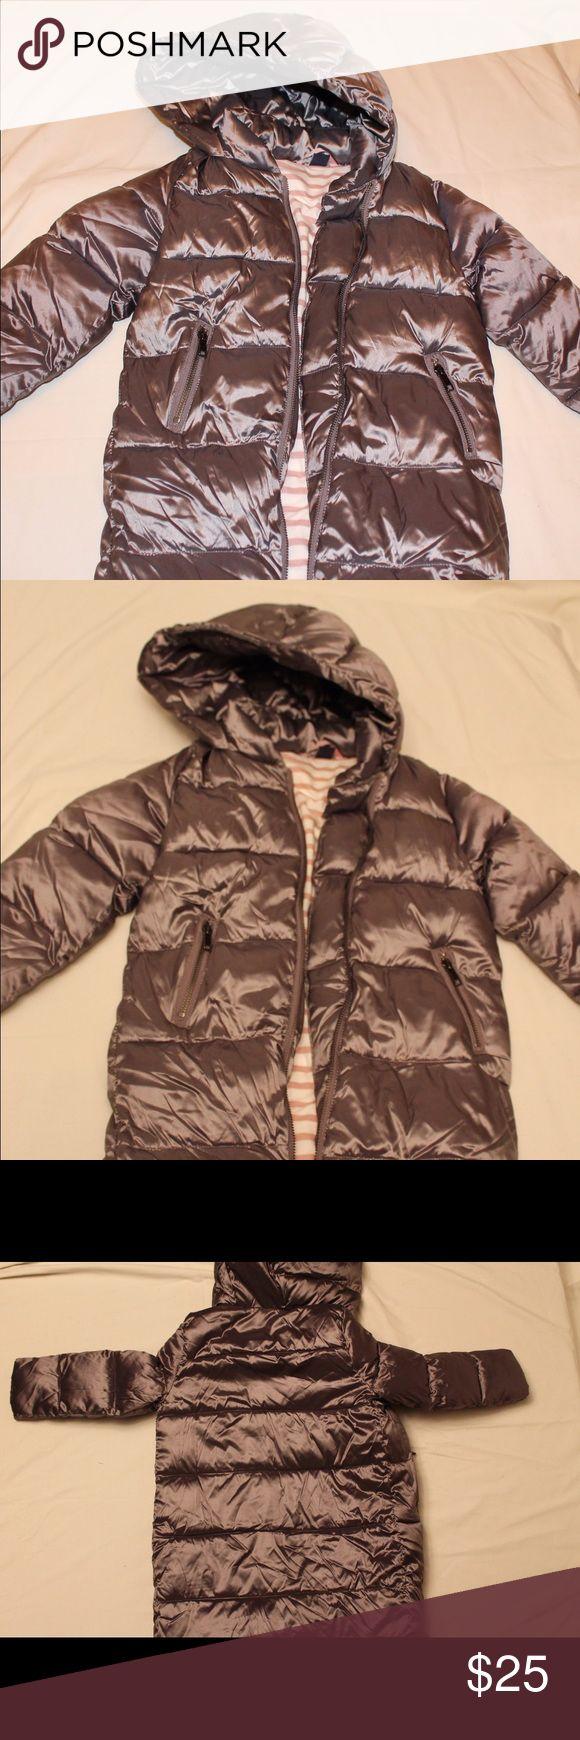 GAP kids Silver water resistant winter Jacket Silver jacket, up to knee, size 5 for Kids GAP Jackets & Coats Raincoats